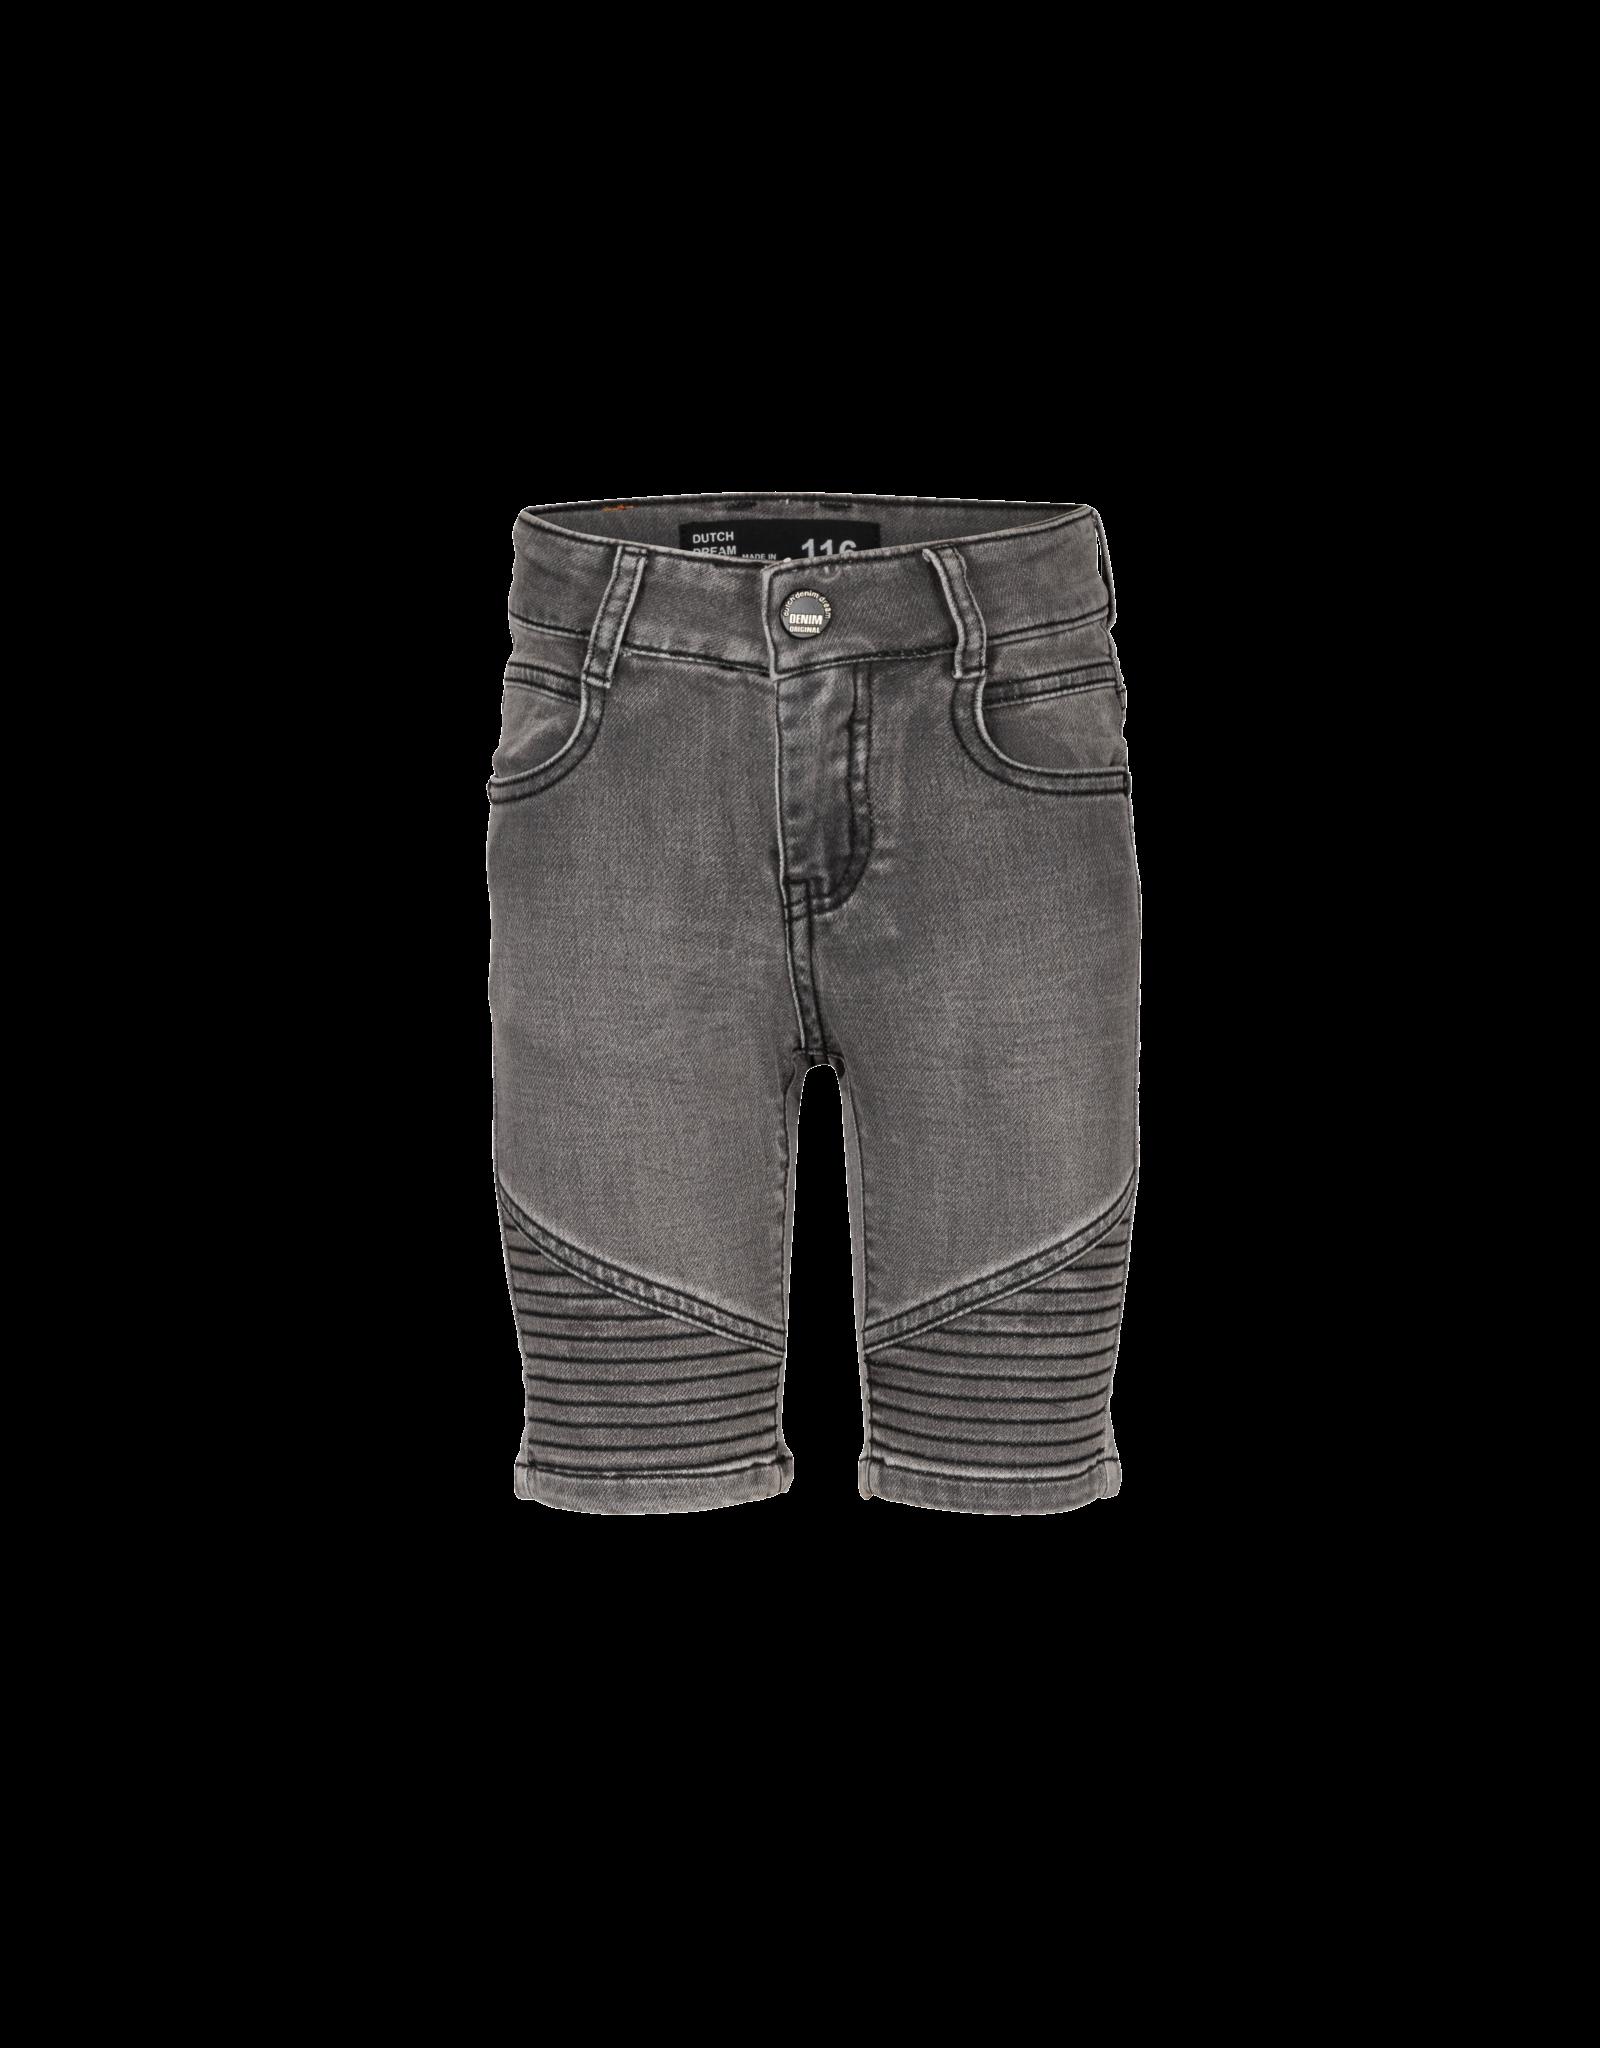 Dutch dream denim VUNJA, EXTRA SLIM FIT Jogg jeans shorts